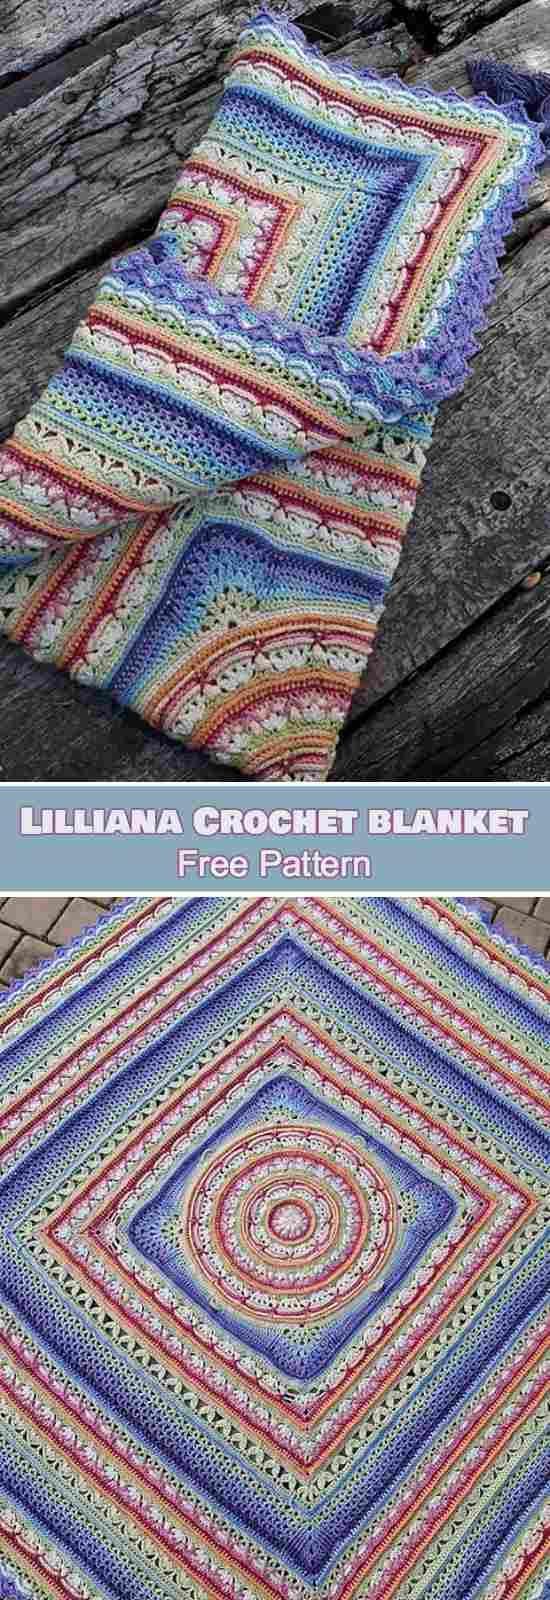 Lilliana Crochet Blanket [Free Pattern] Lilliana Throw, Afghan, Wonderful pattern for baby blanket, doily or pillow.